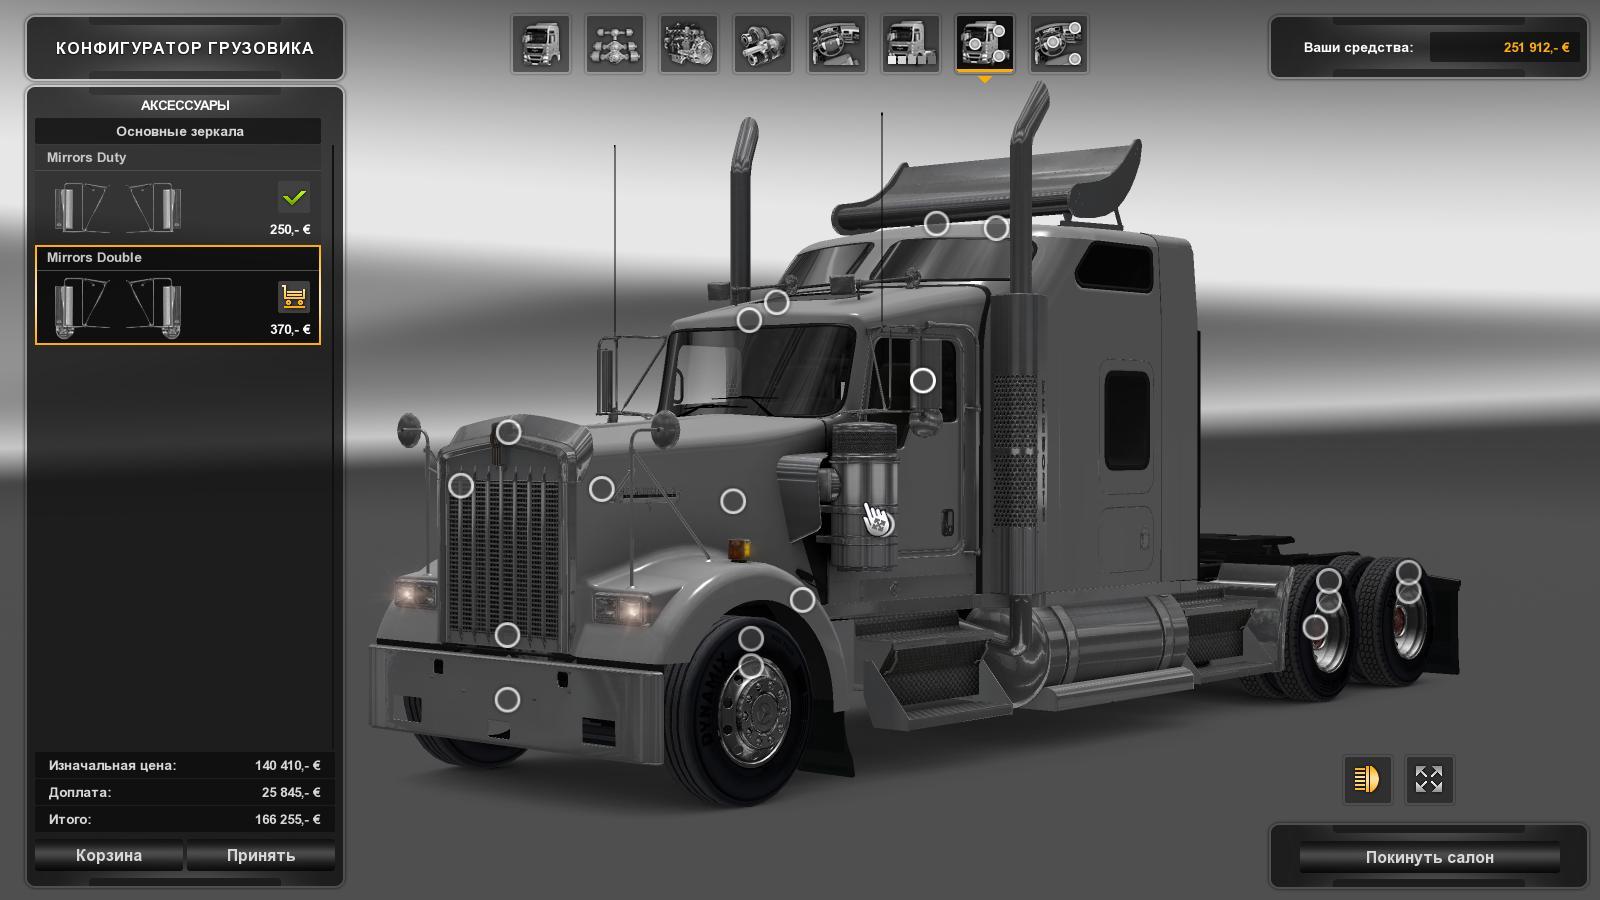 V8 illegal reworked truck v5 0 simulator games mods download - Kenworth W900 1 23 Truck Truck Simulator Mods